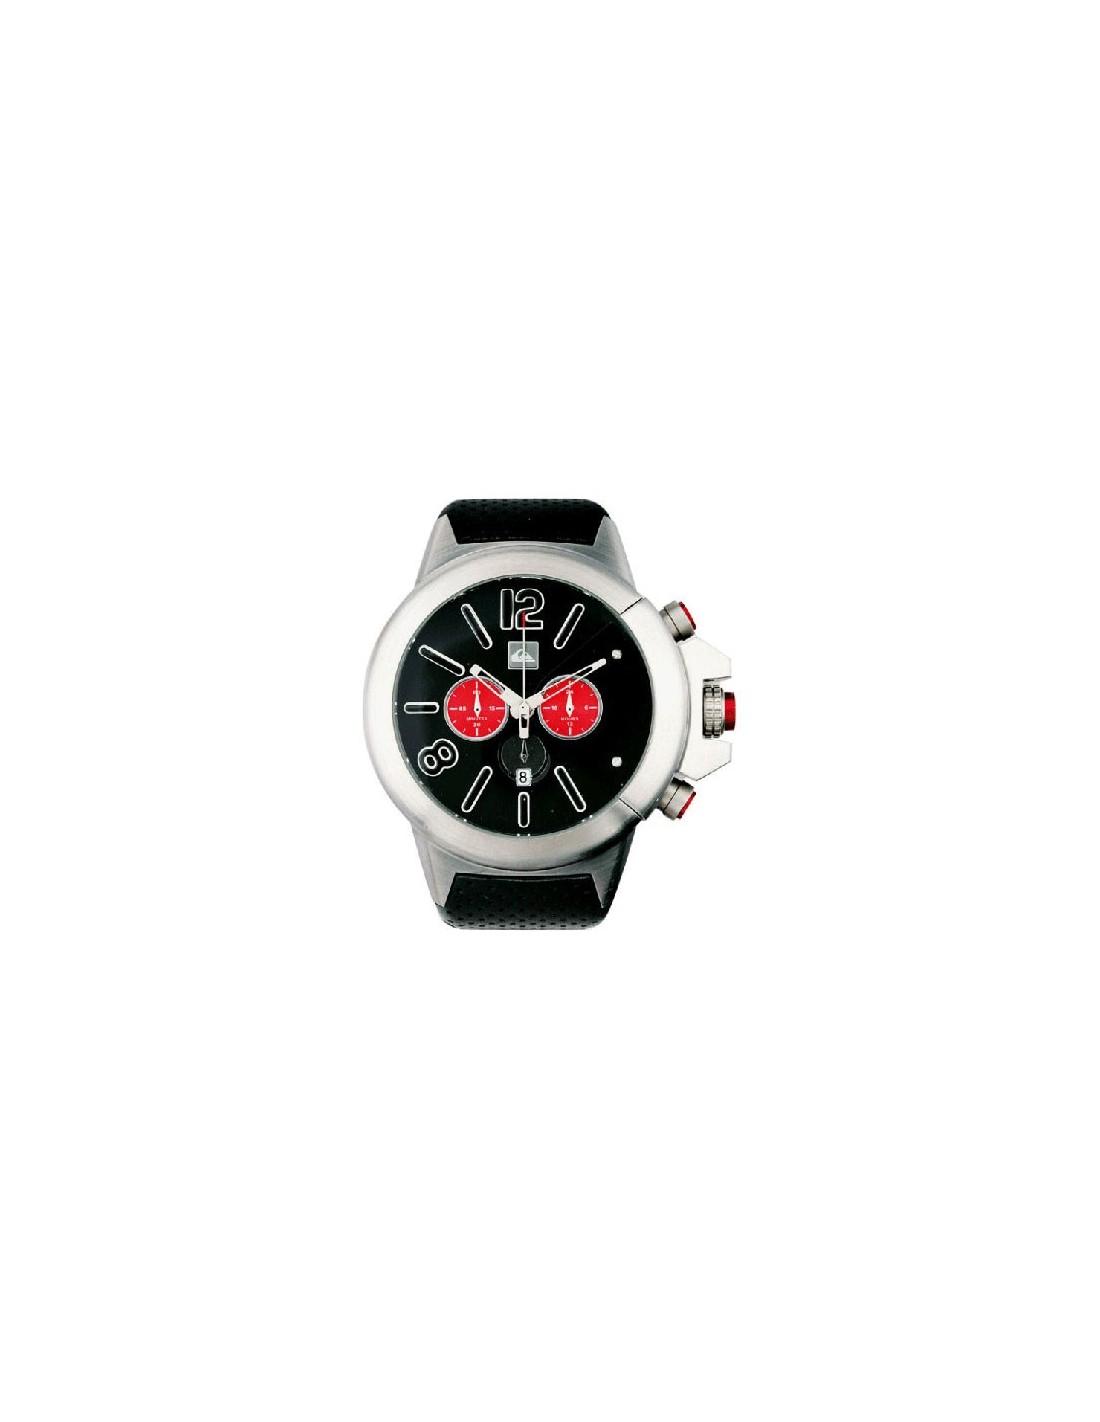 540fc79cc37c5 Relógio Quiksilver M121CR-ASIL - Relógios Quiksilver